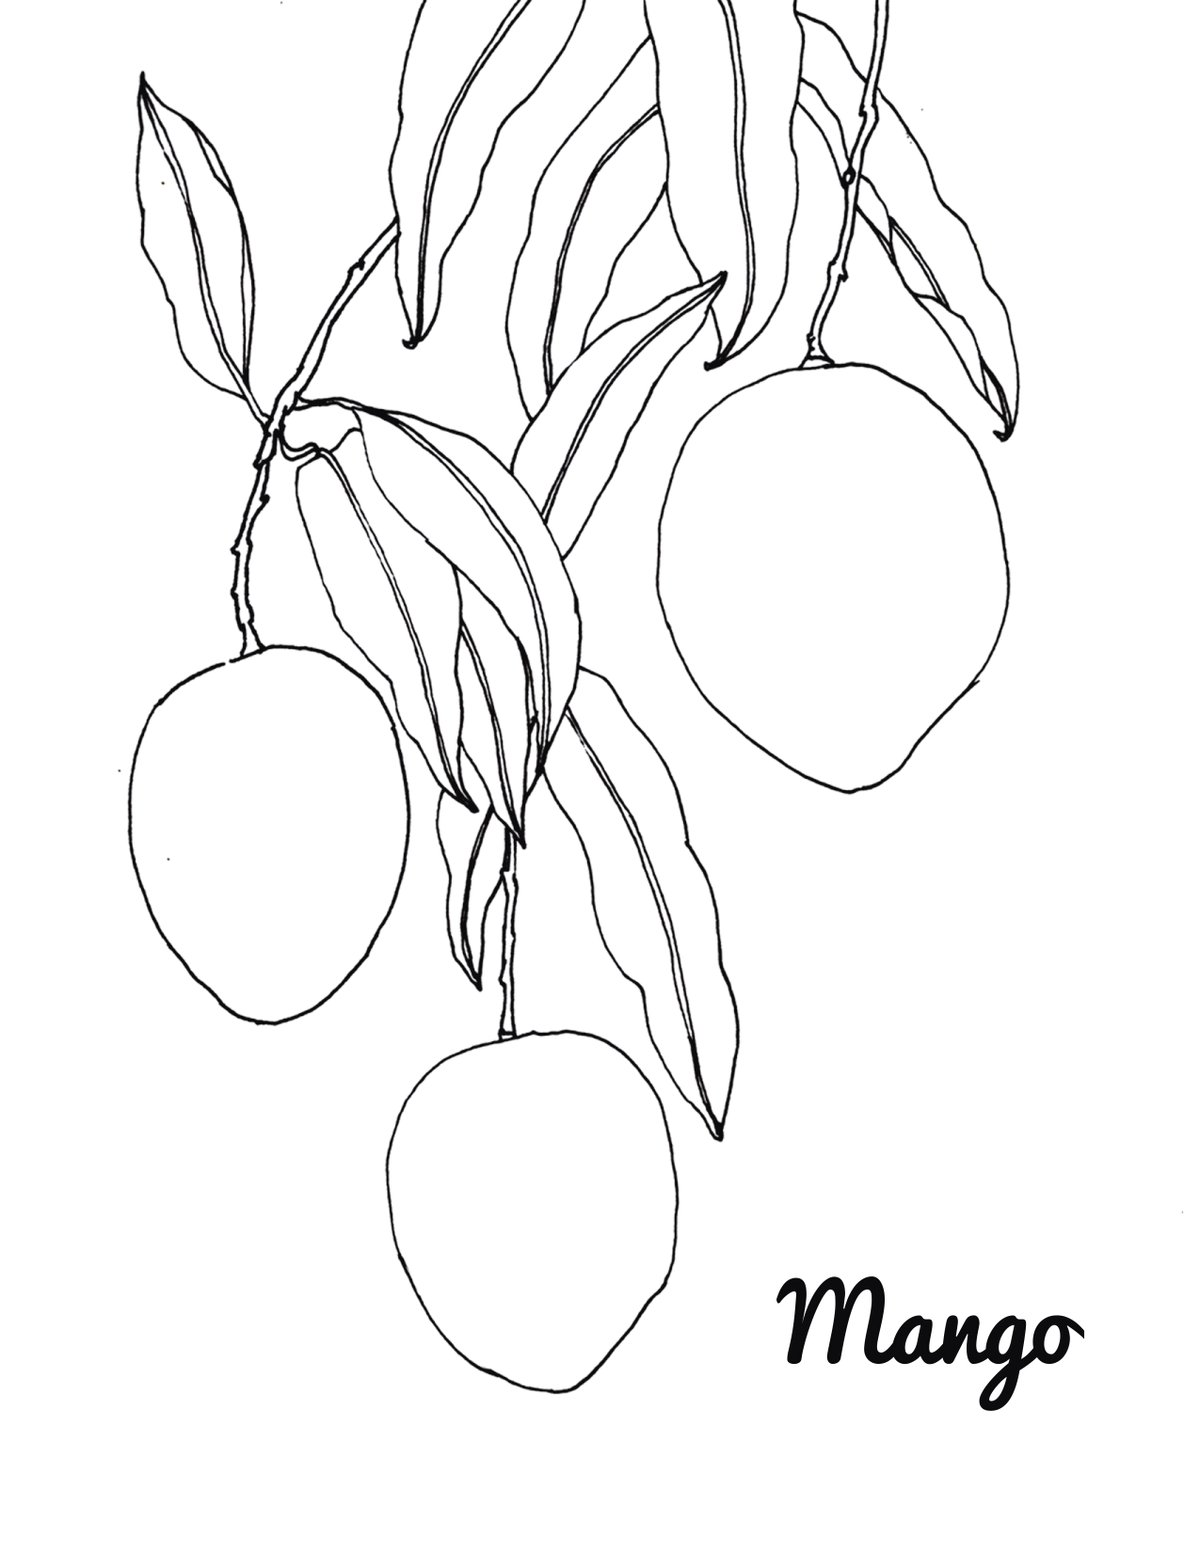 Mango Coloring